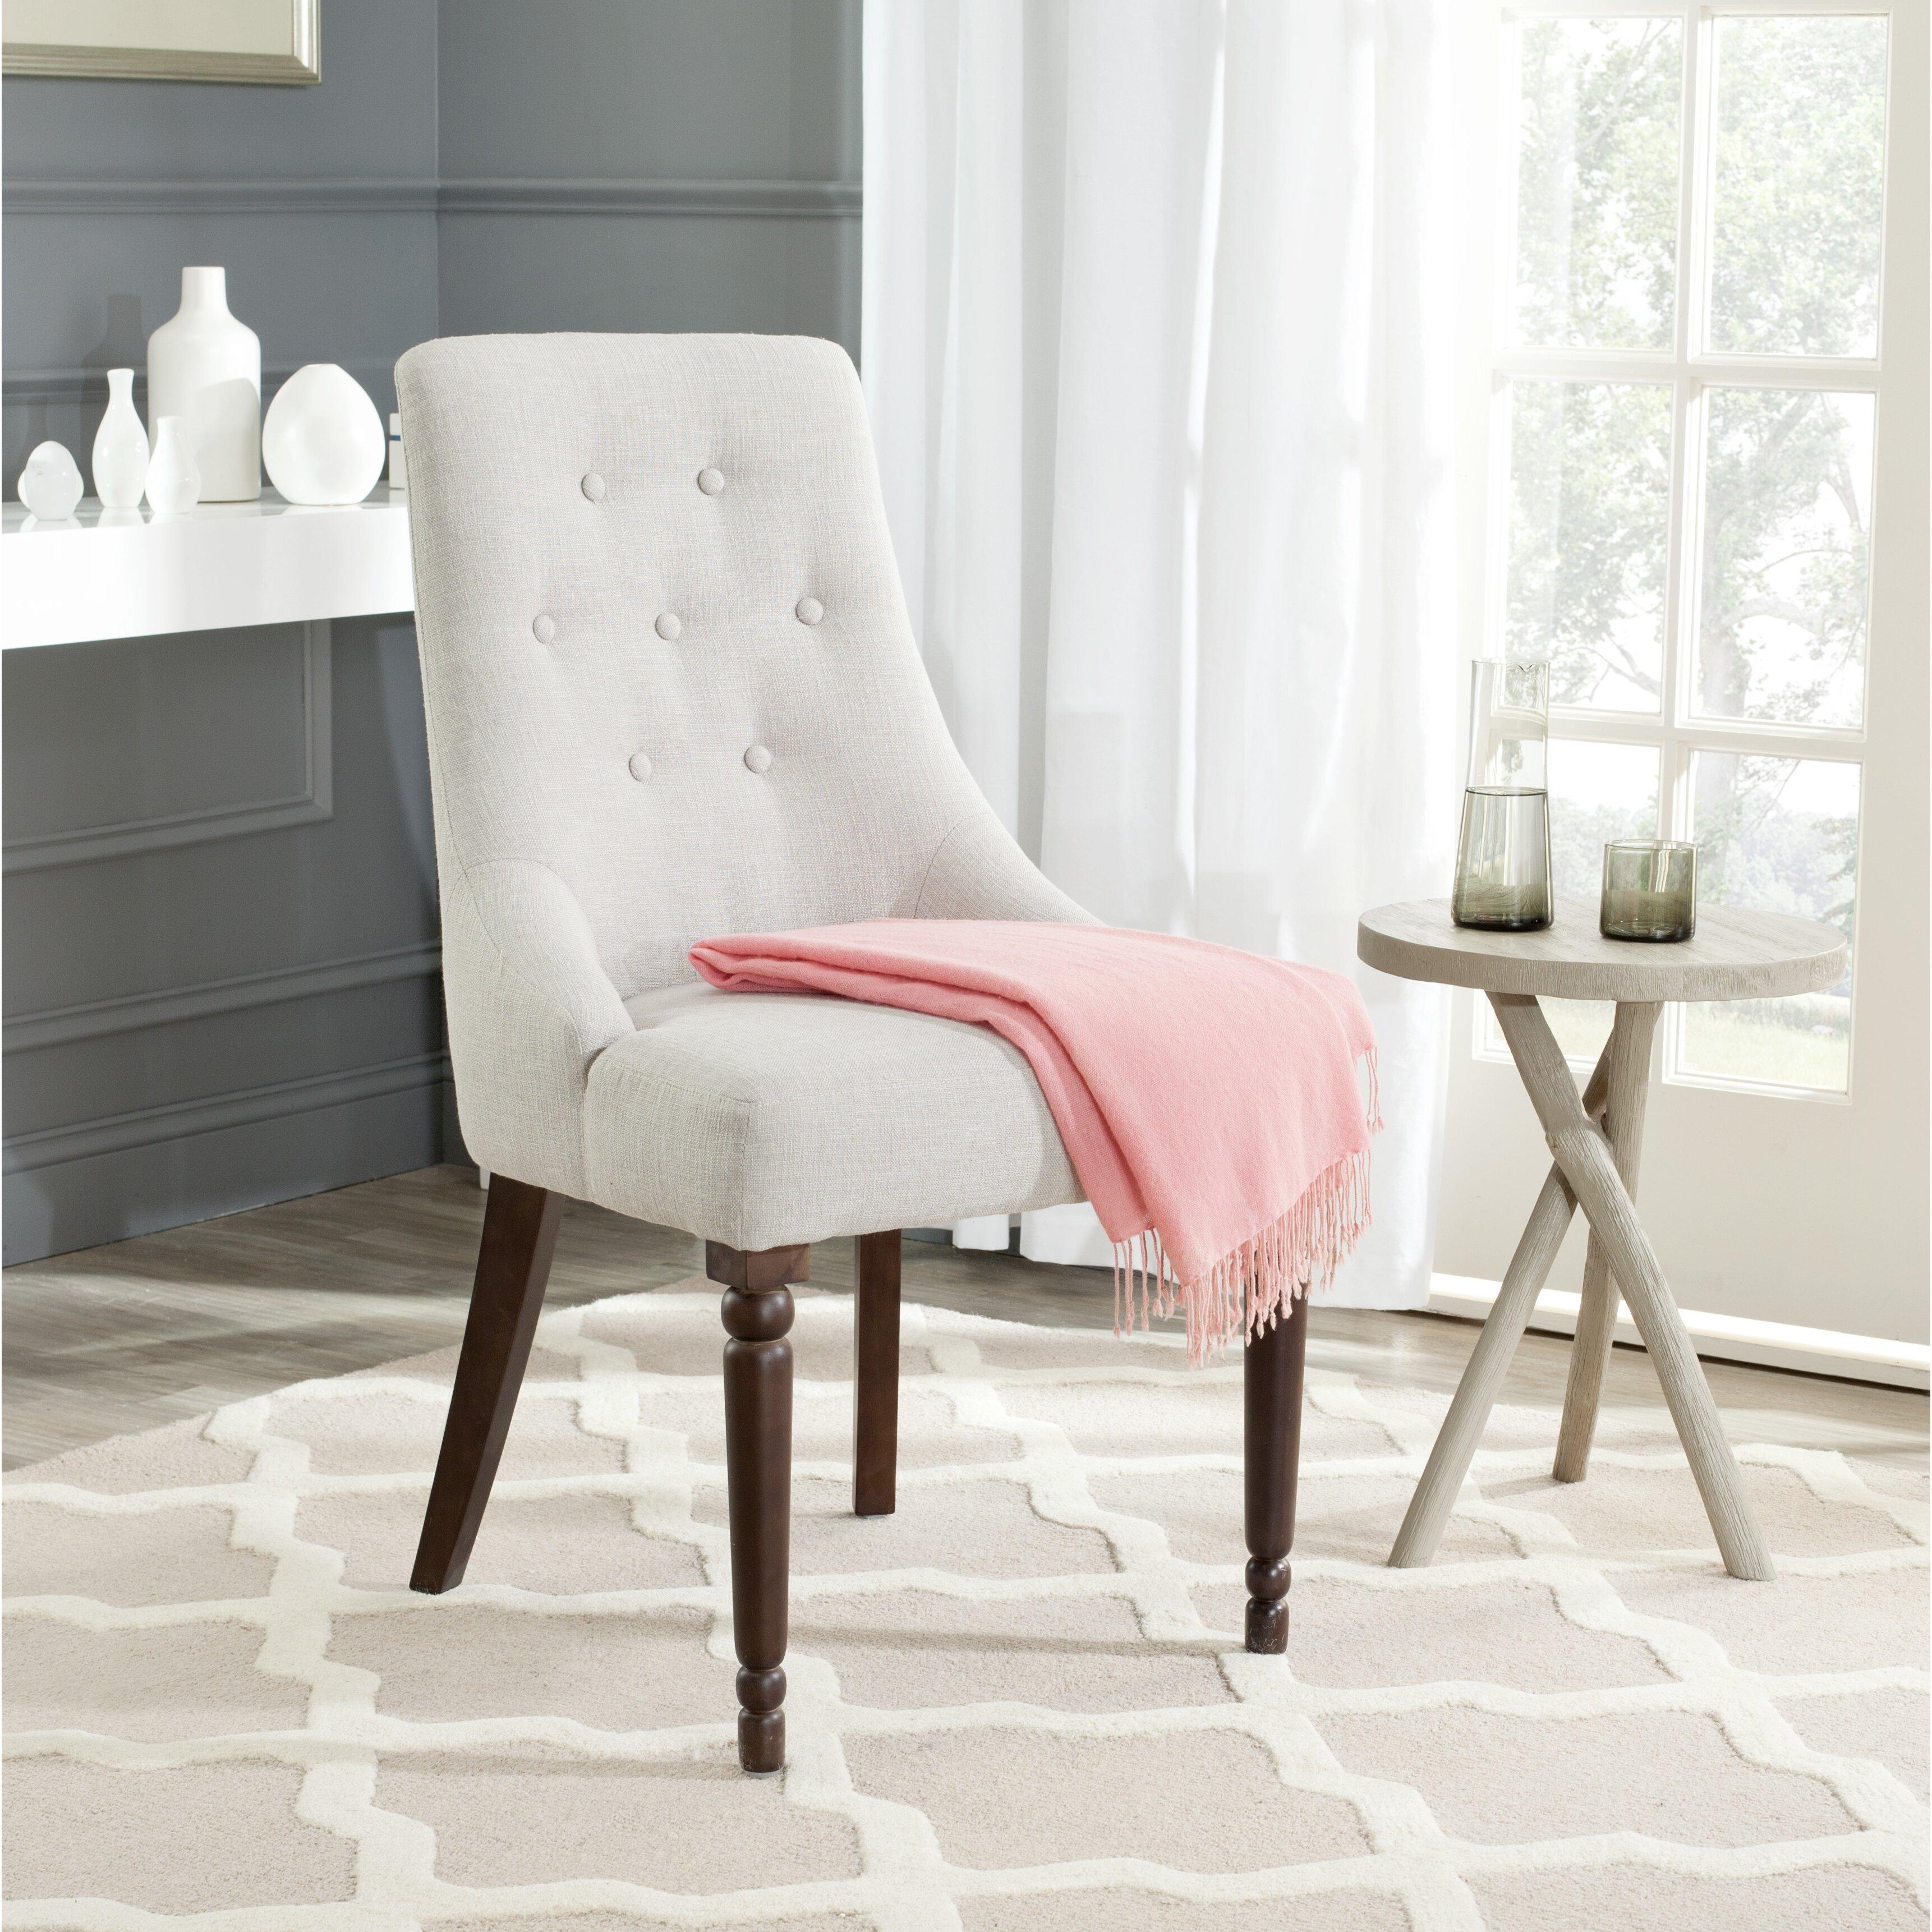 safavieh karna dining chair safavieh safavieh karna dining chair in black set of 2 safavieh. Black Bedroom Furniture Sets. Home Design Ideas